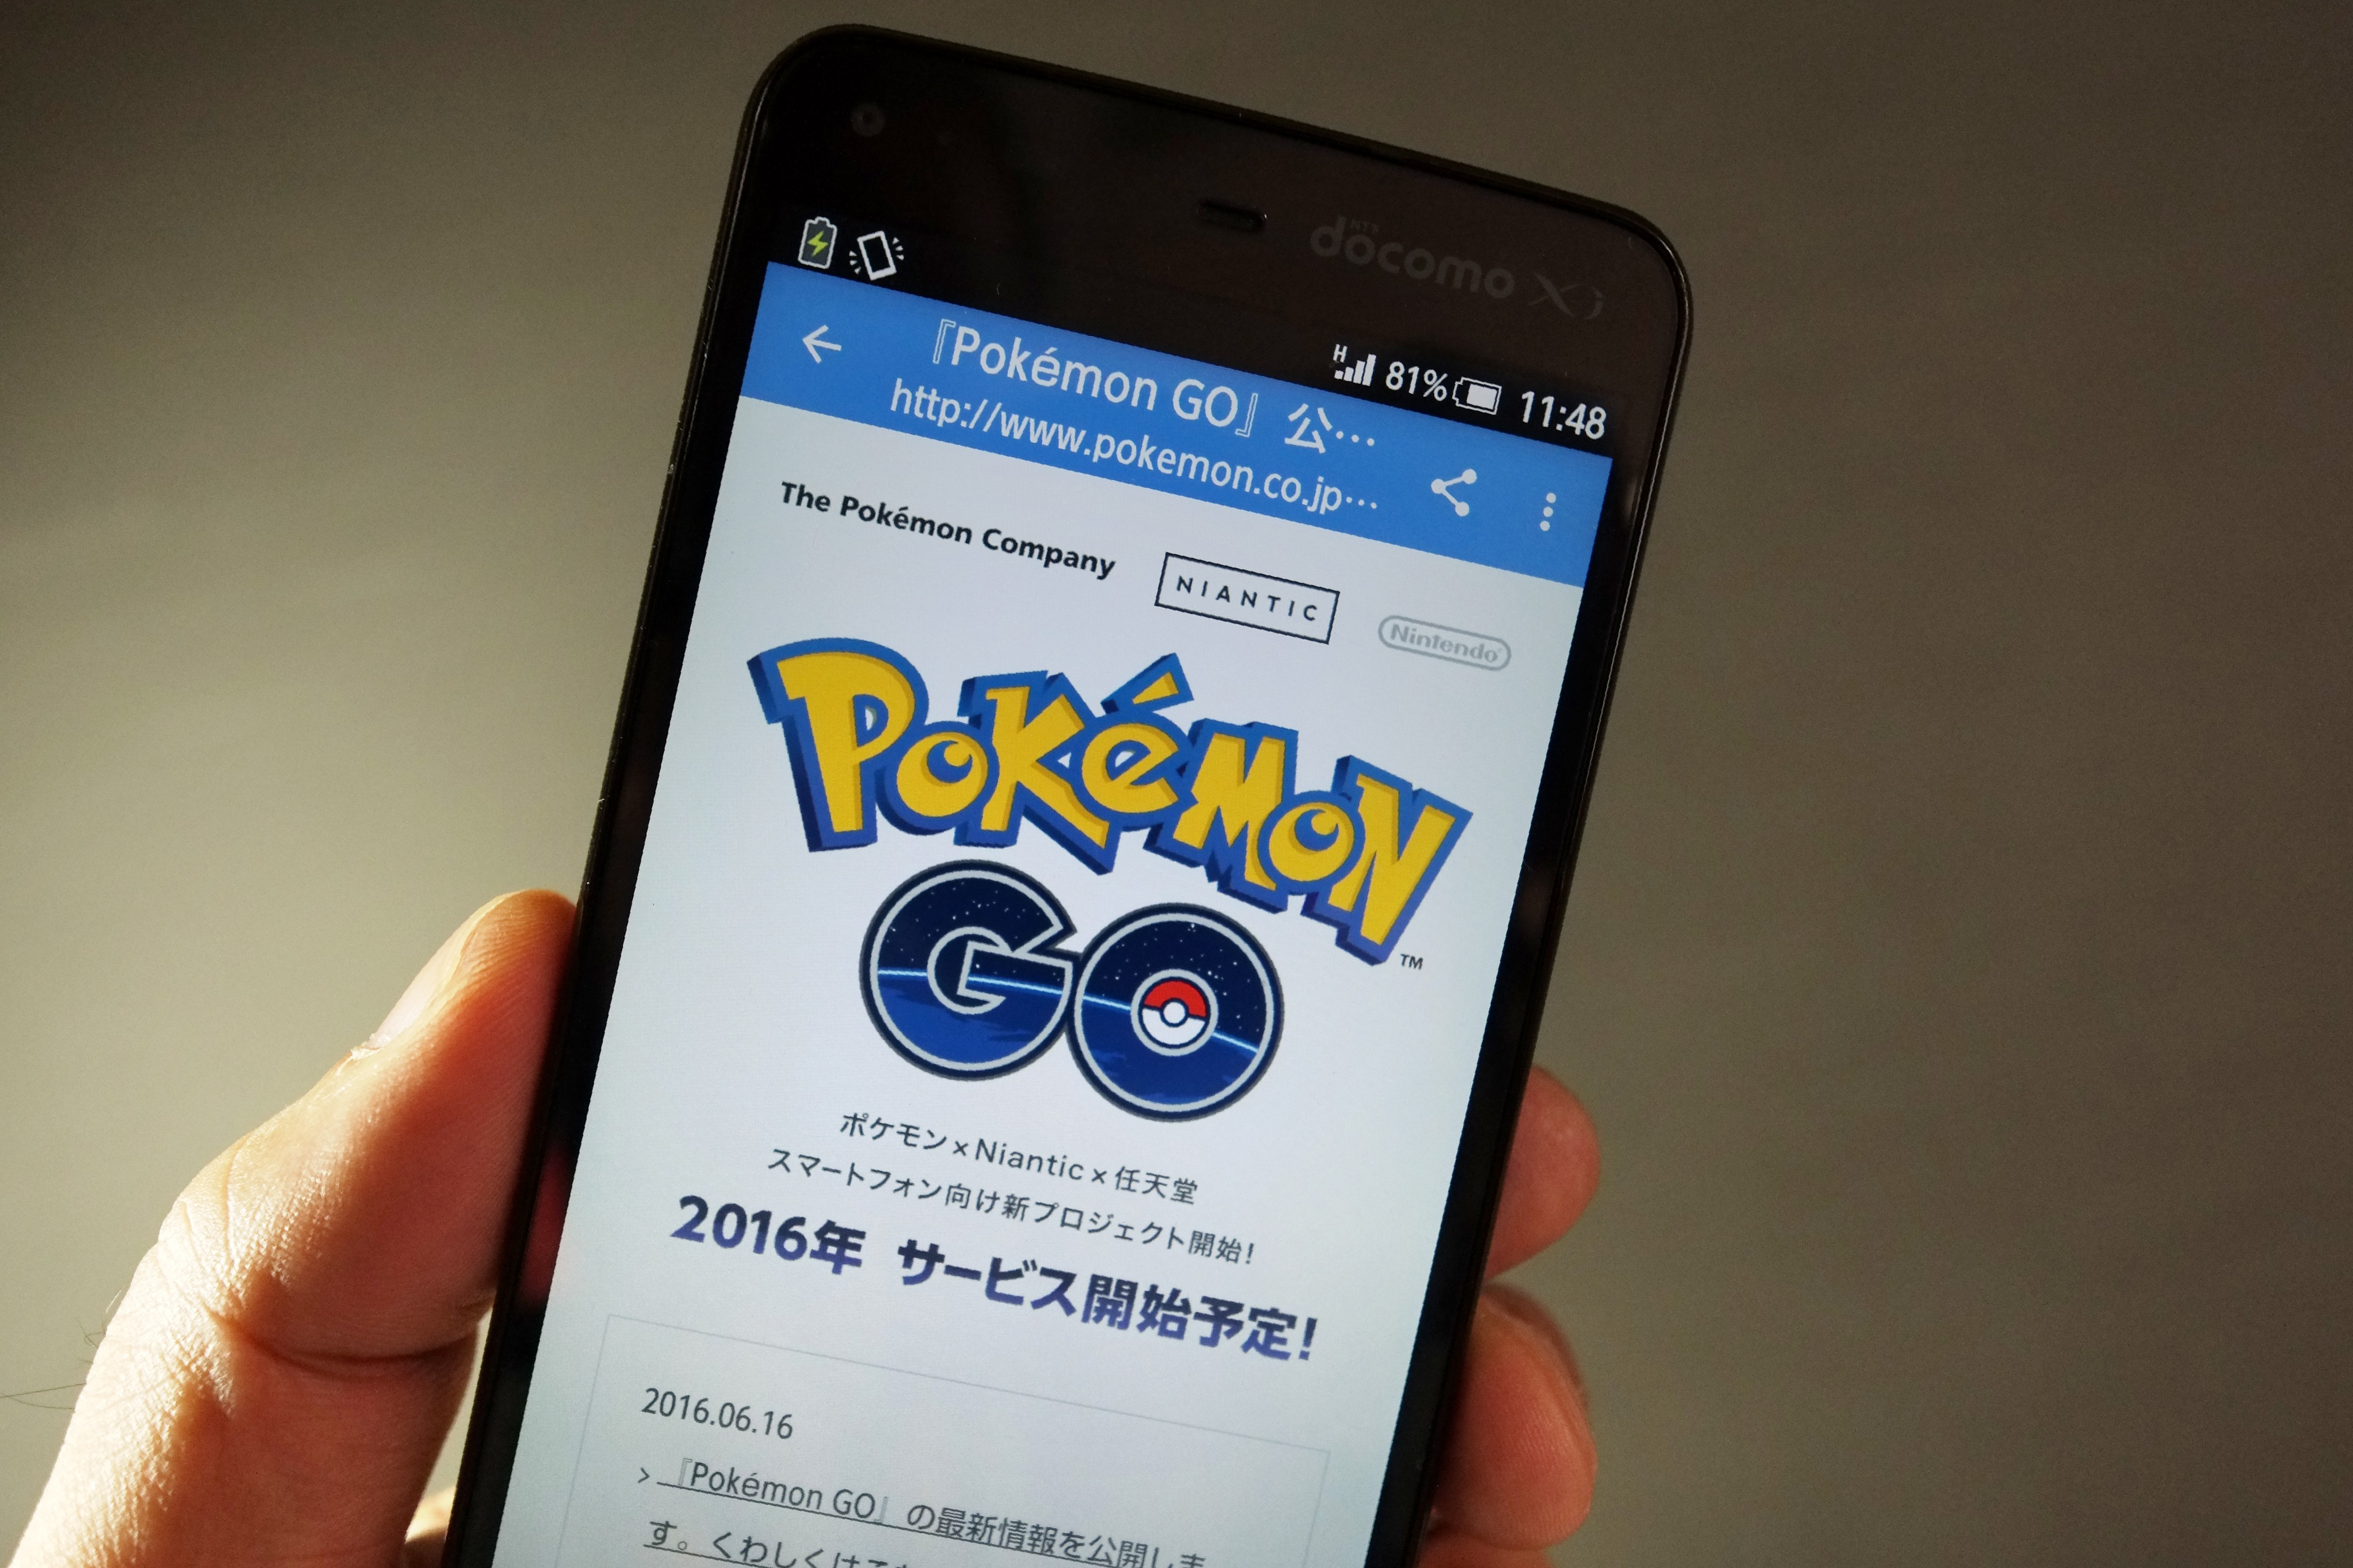 Pokémon Go's surprising roots: bug catching - Vox